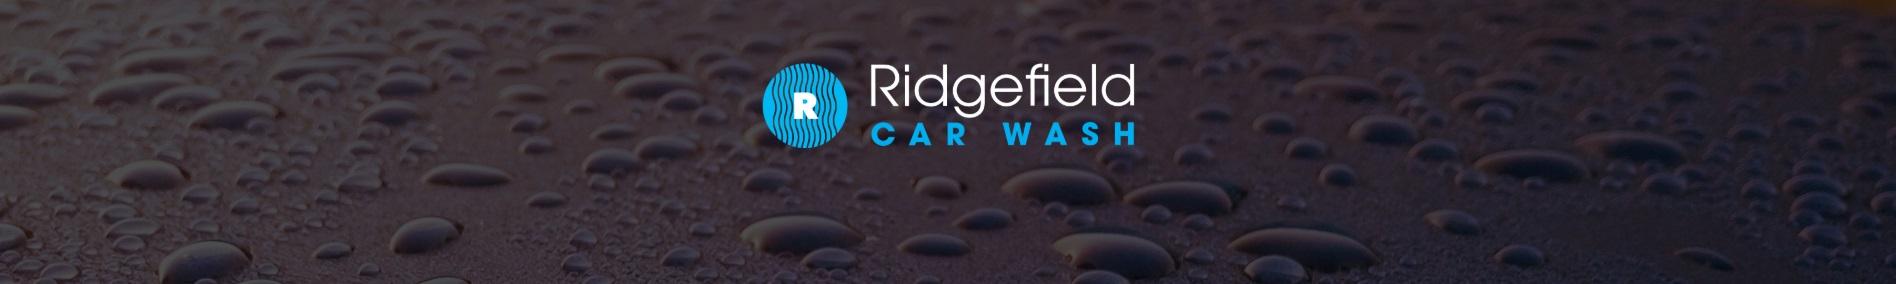 Ridgefield Car Wash